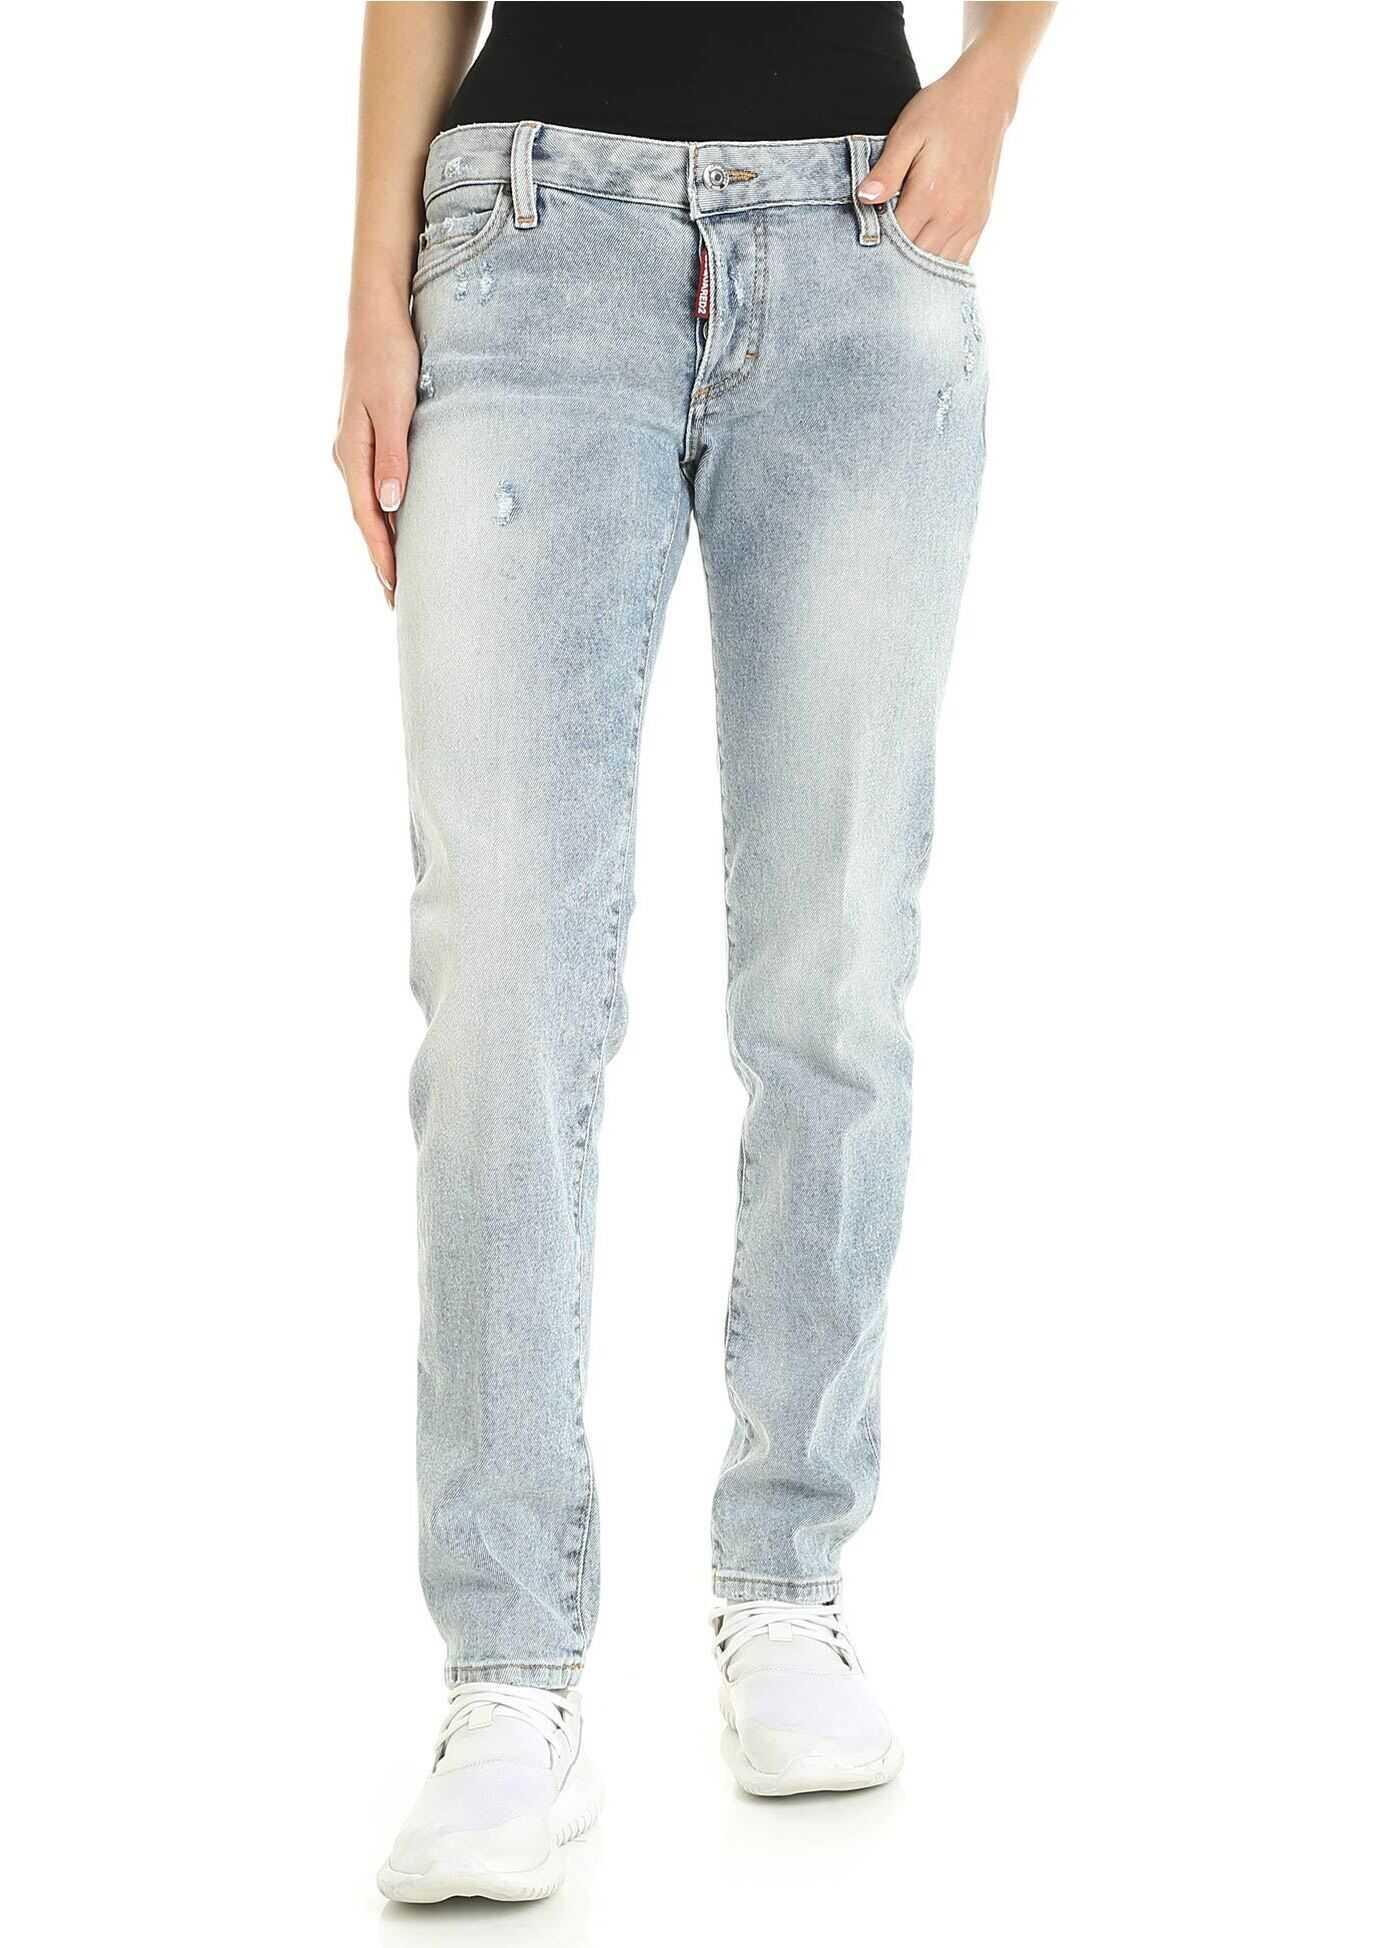 DSQUARED2 Jennifer Jeans In Light Blue Light Blue